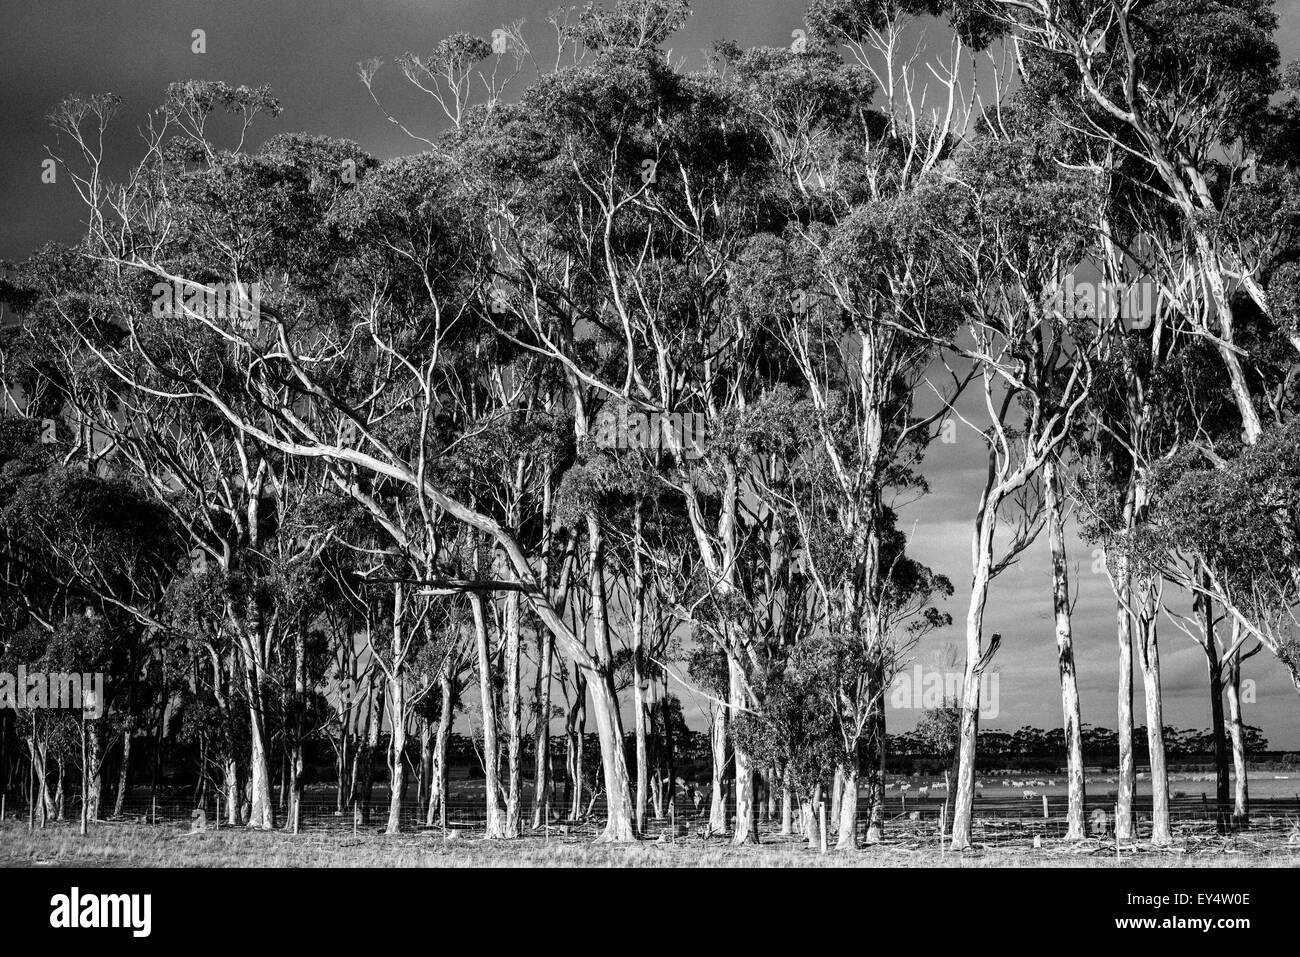 Eucalyptus trees on the roadside near Lismore, Victoria, Australia - Stock Image